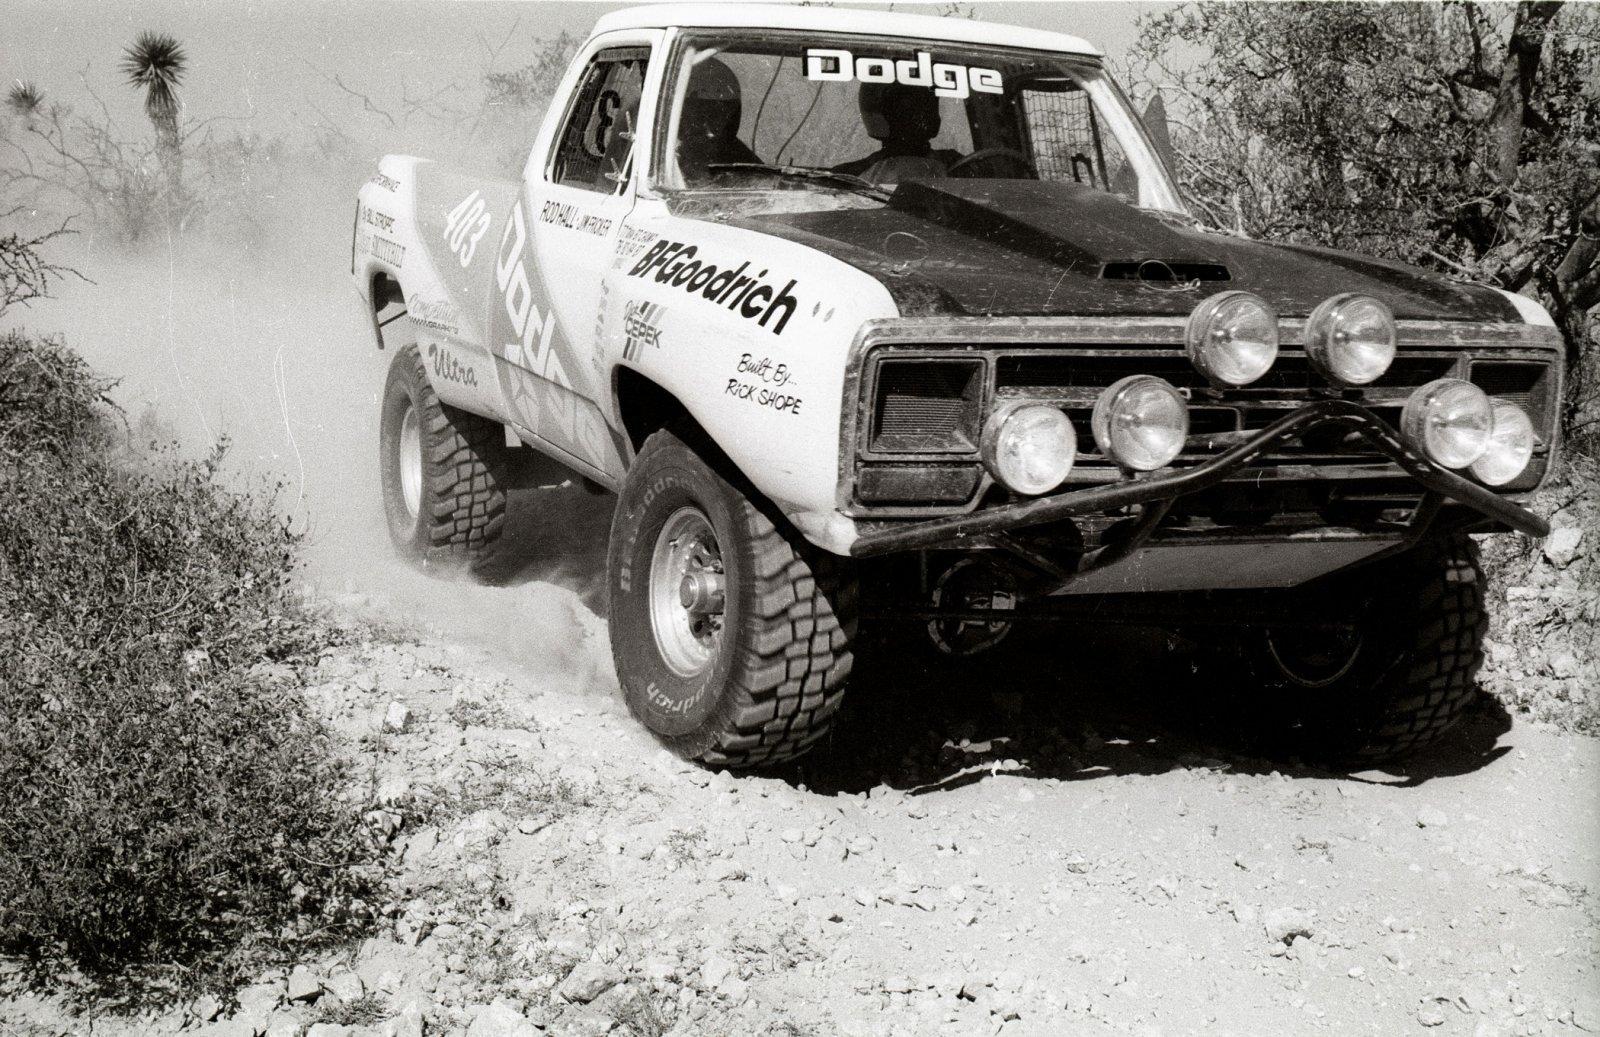 1989. Baja1000. 403. Hall. 21x.jpg